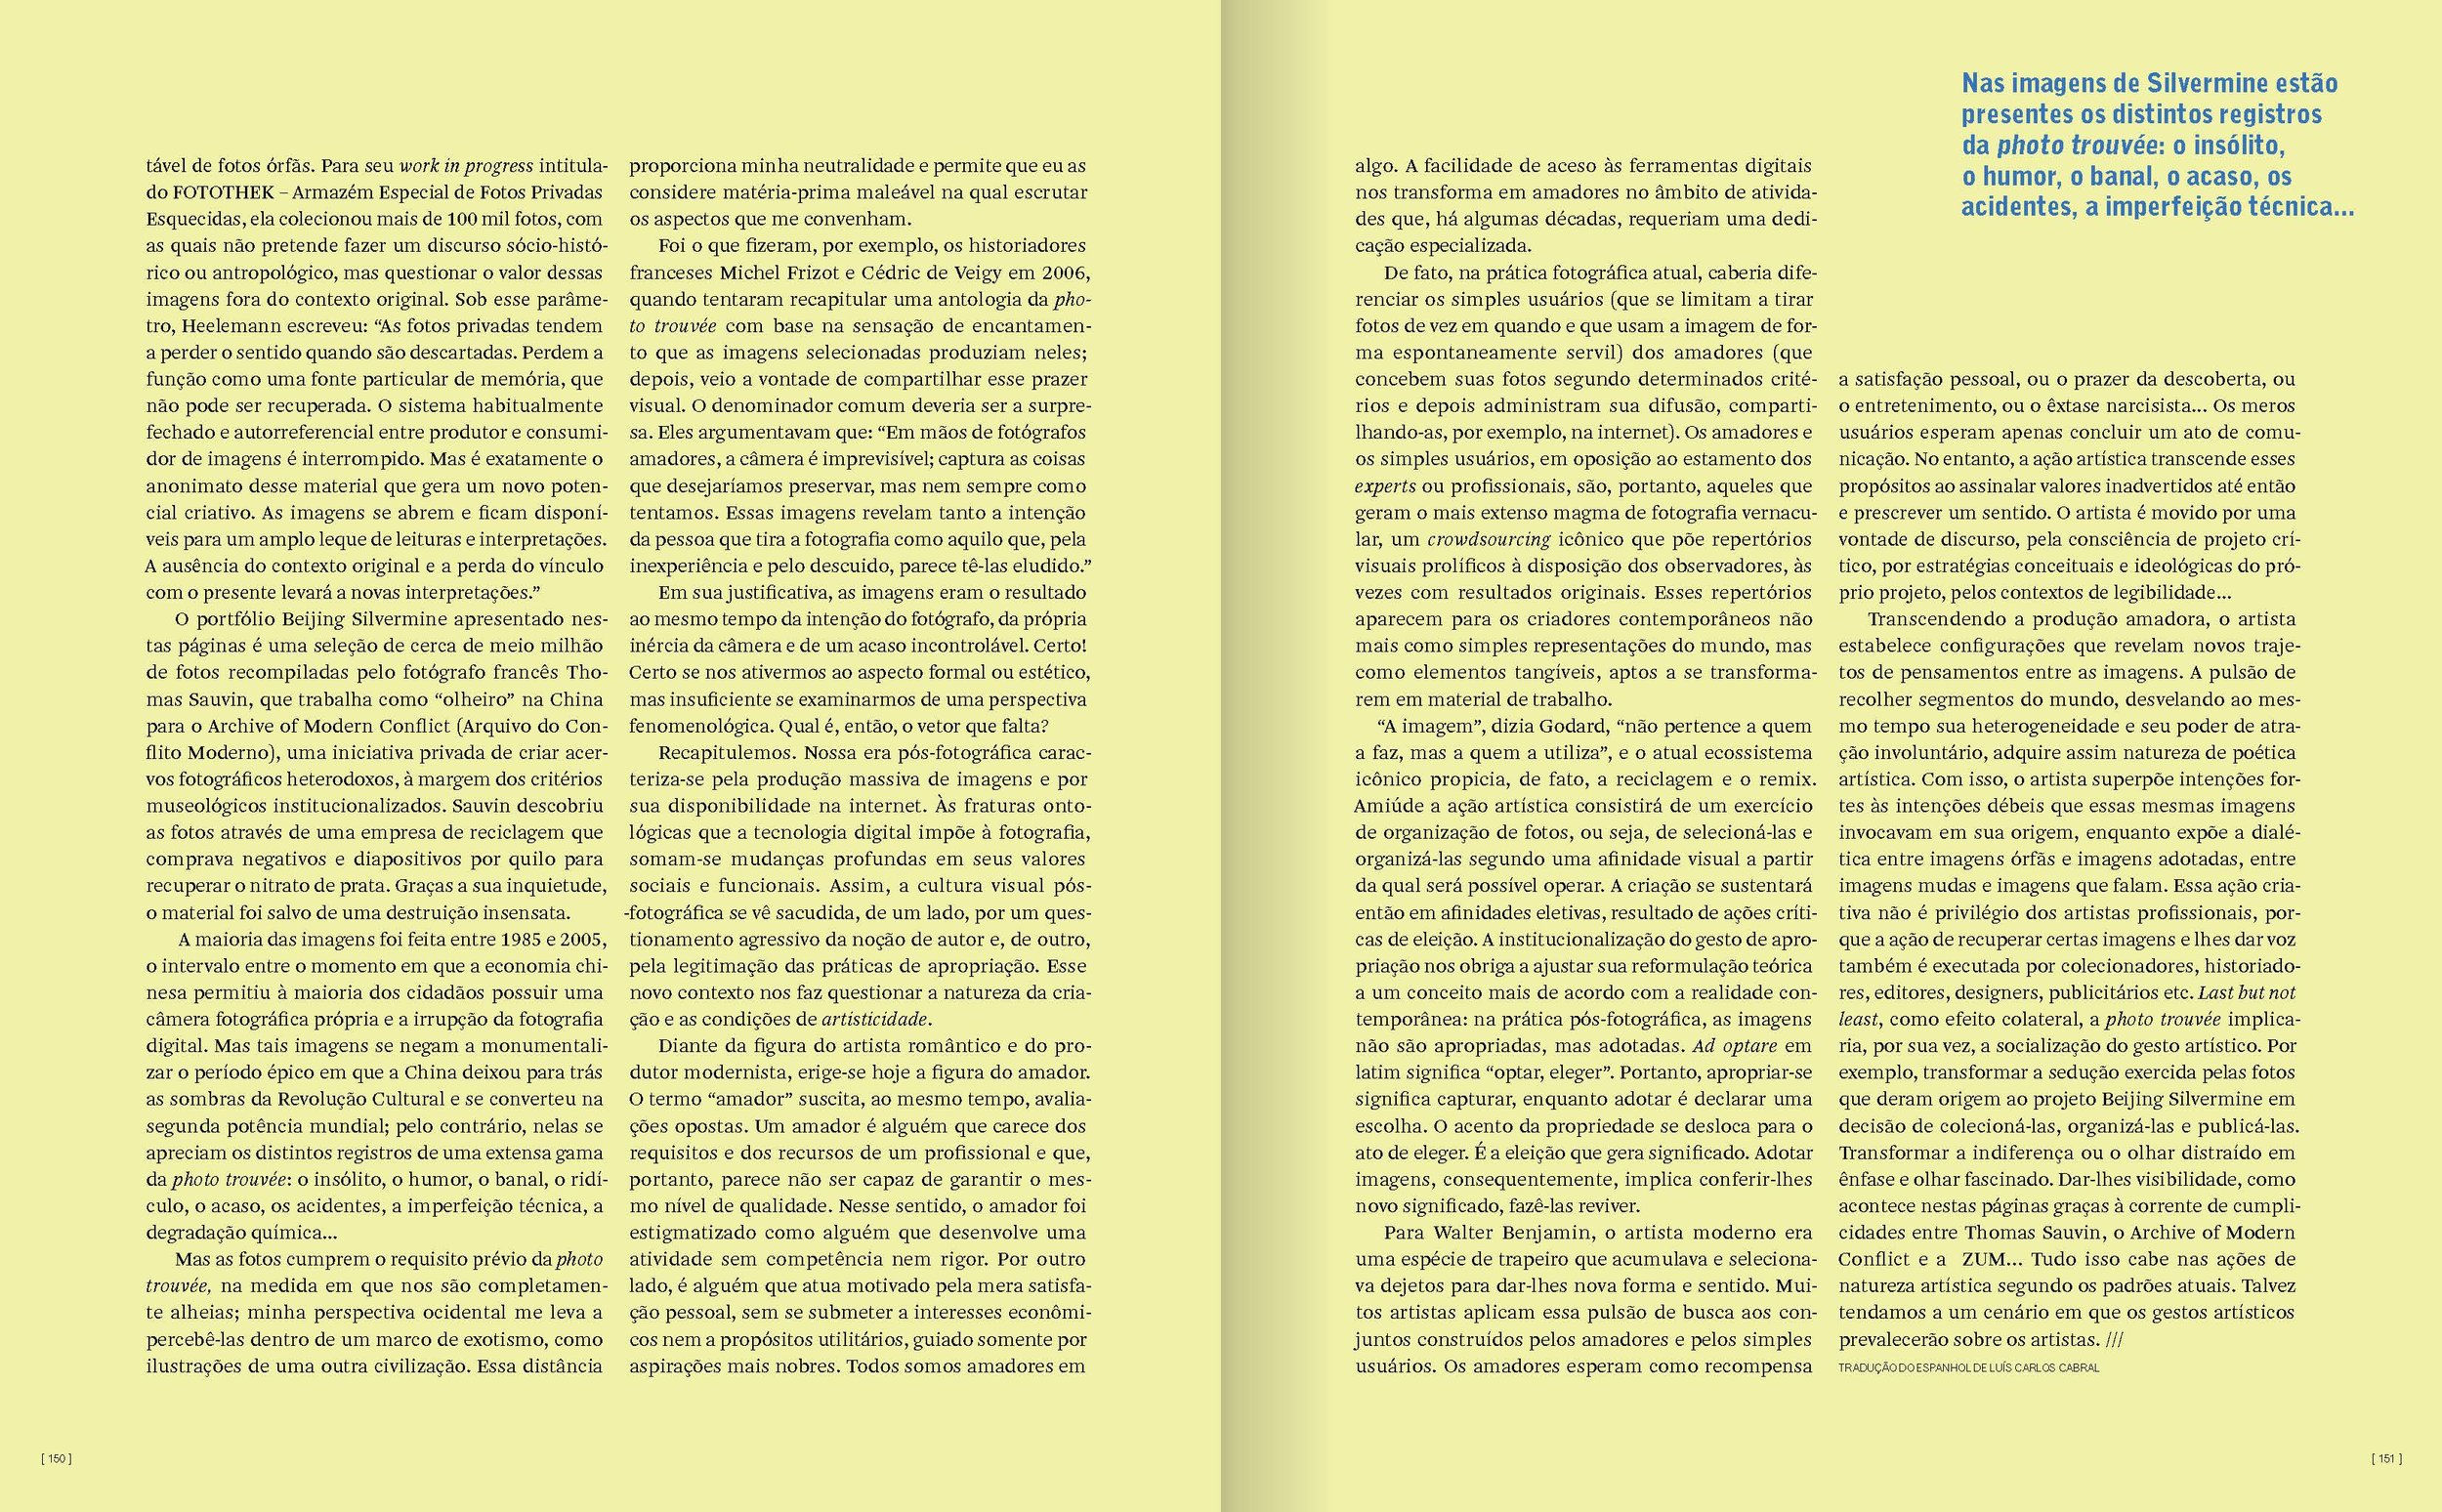 ZUM Magazine - Silvermine 2013 Text by Joan Fontcuberta_Page_12.jpg